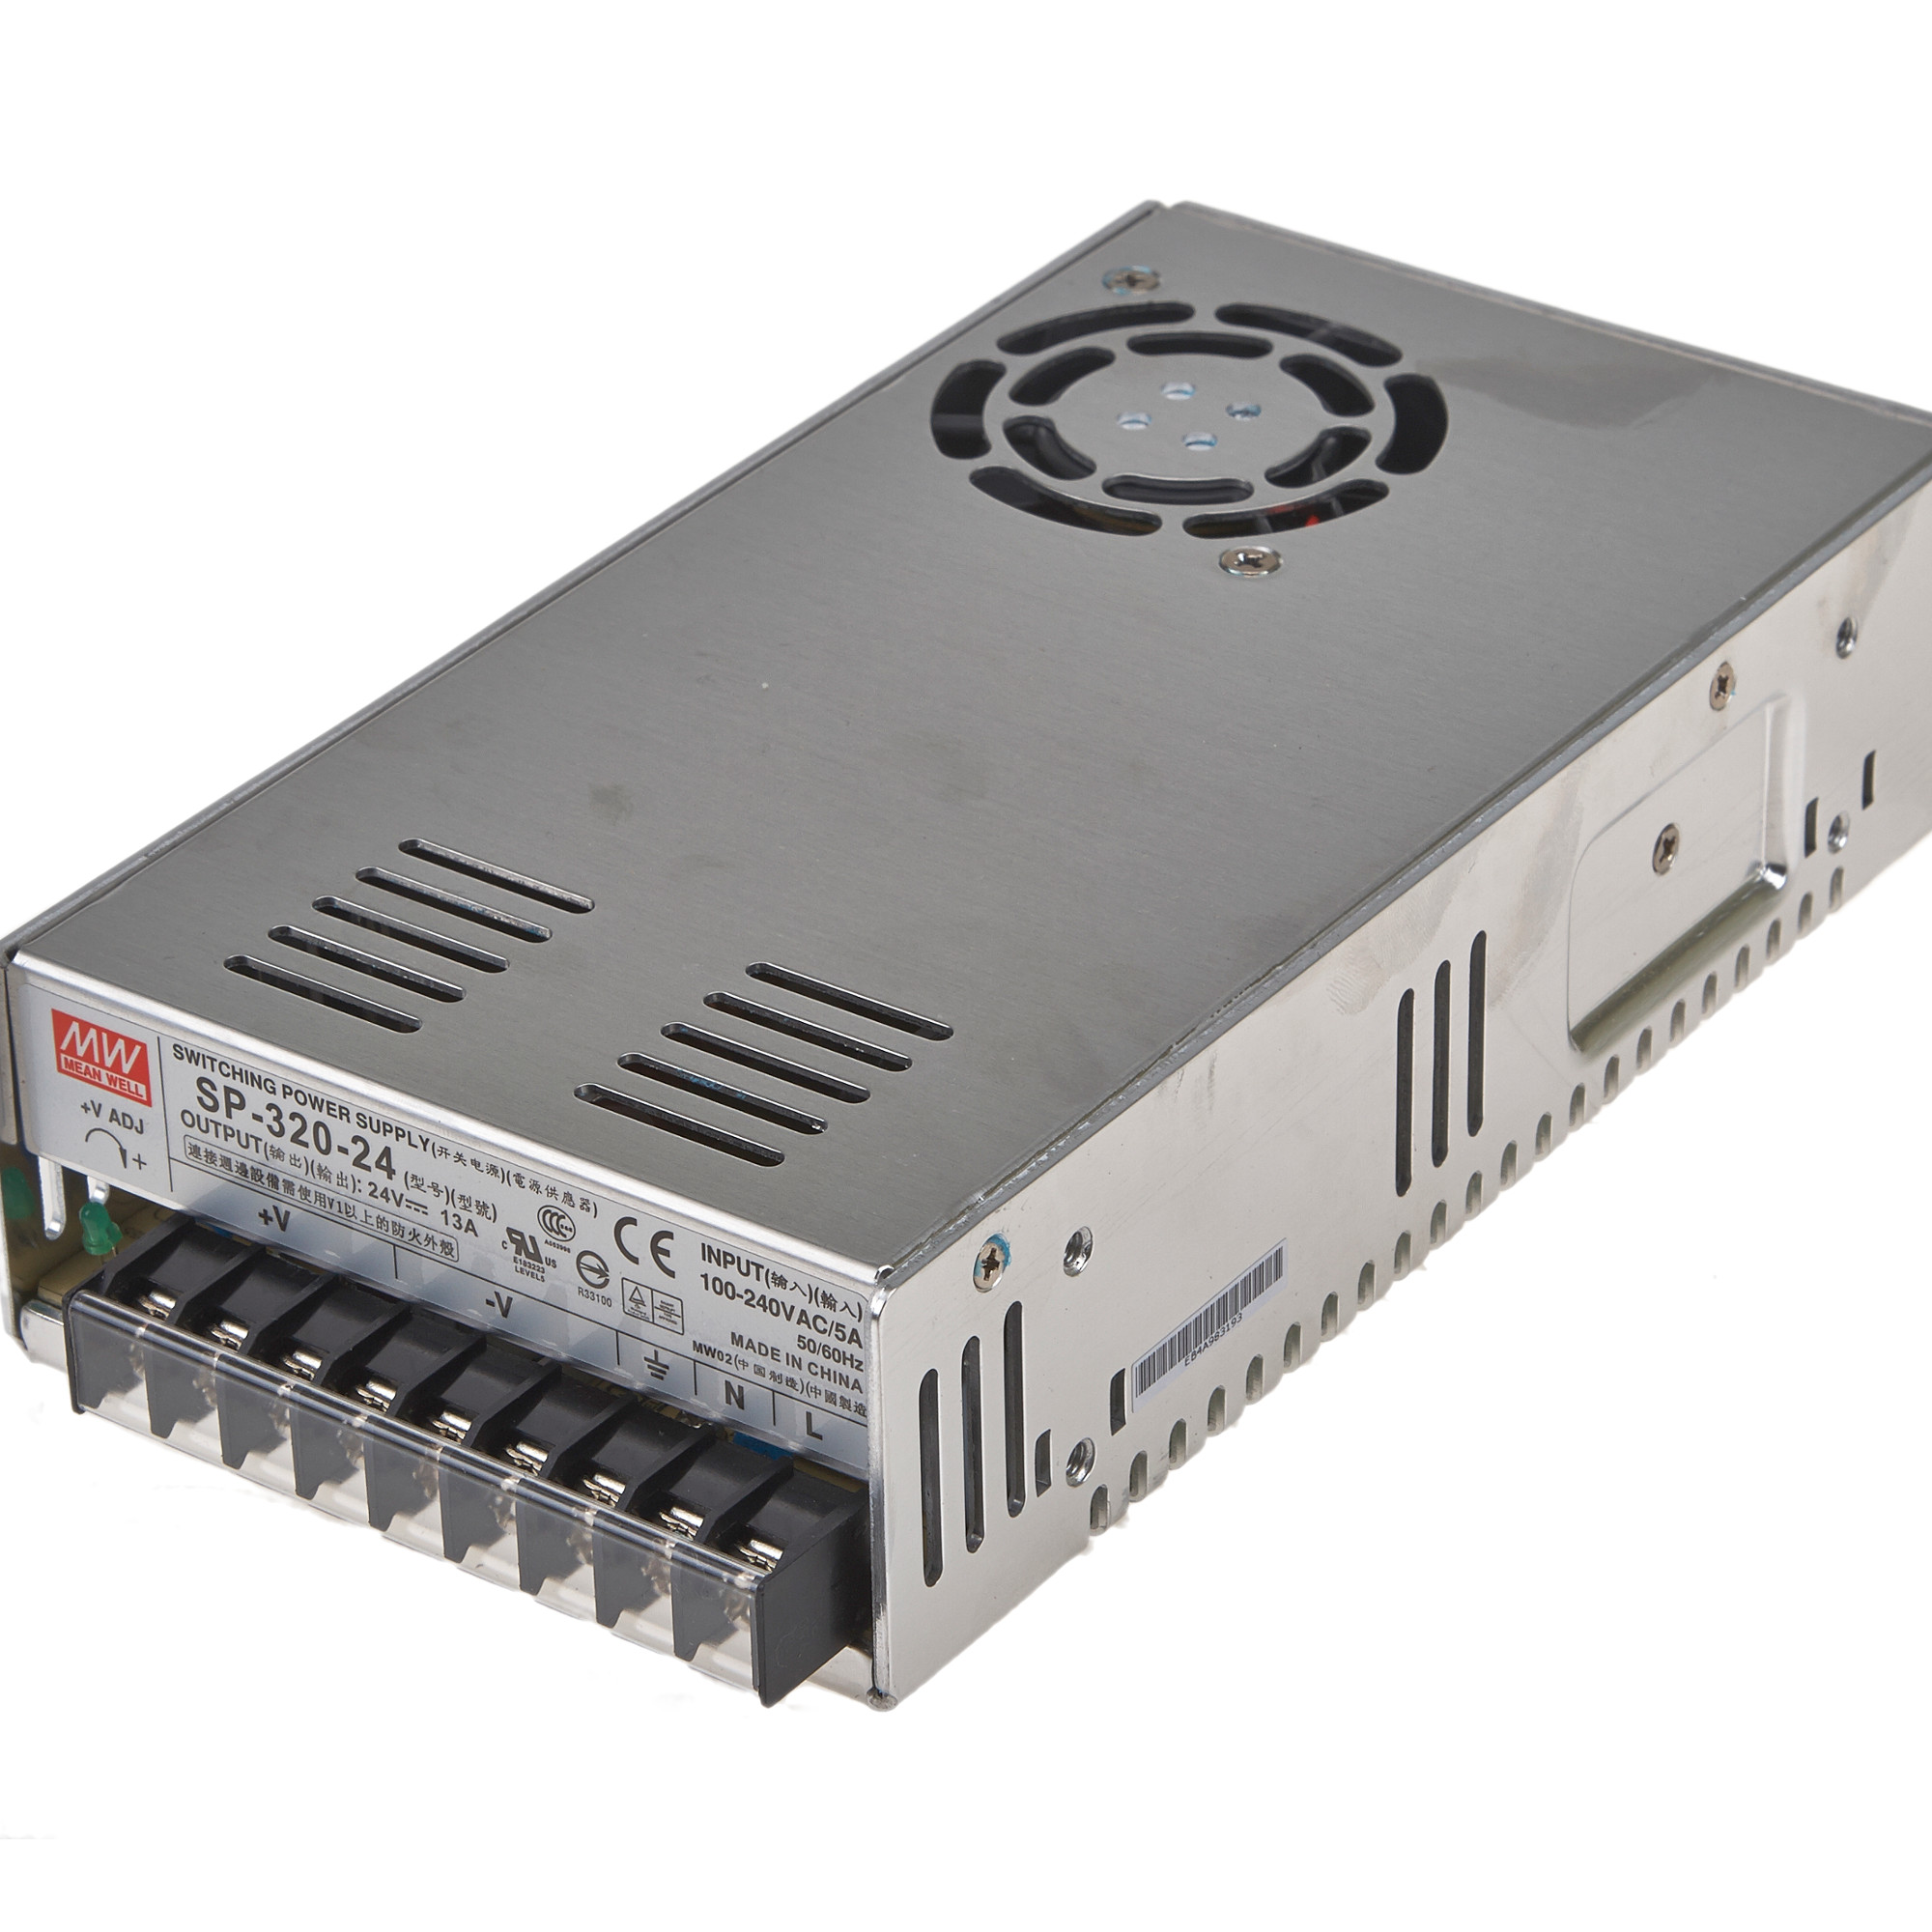 24v dc power supply headglow for Power supply for 24v dc motor